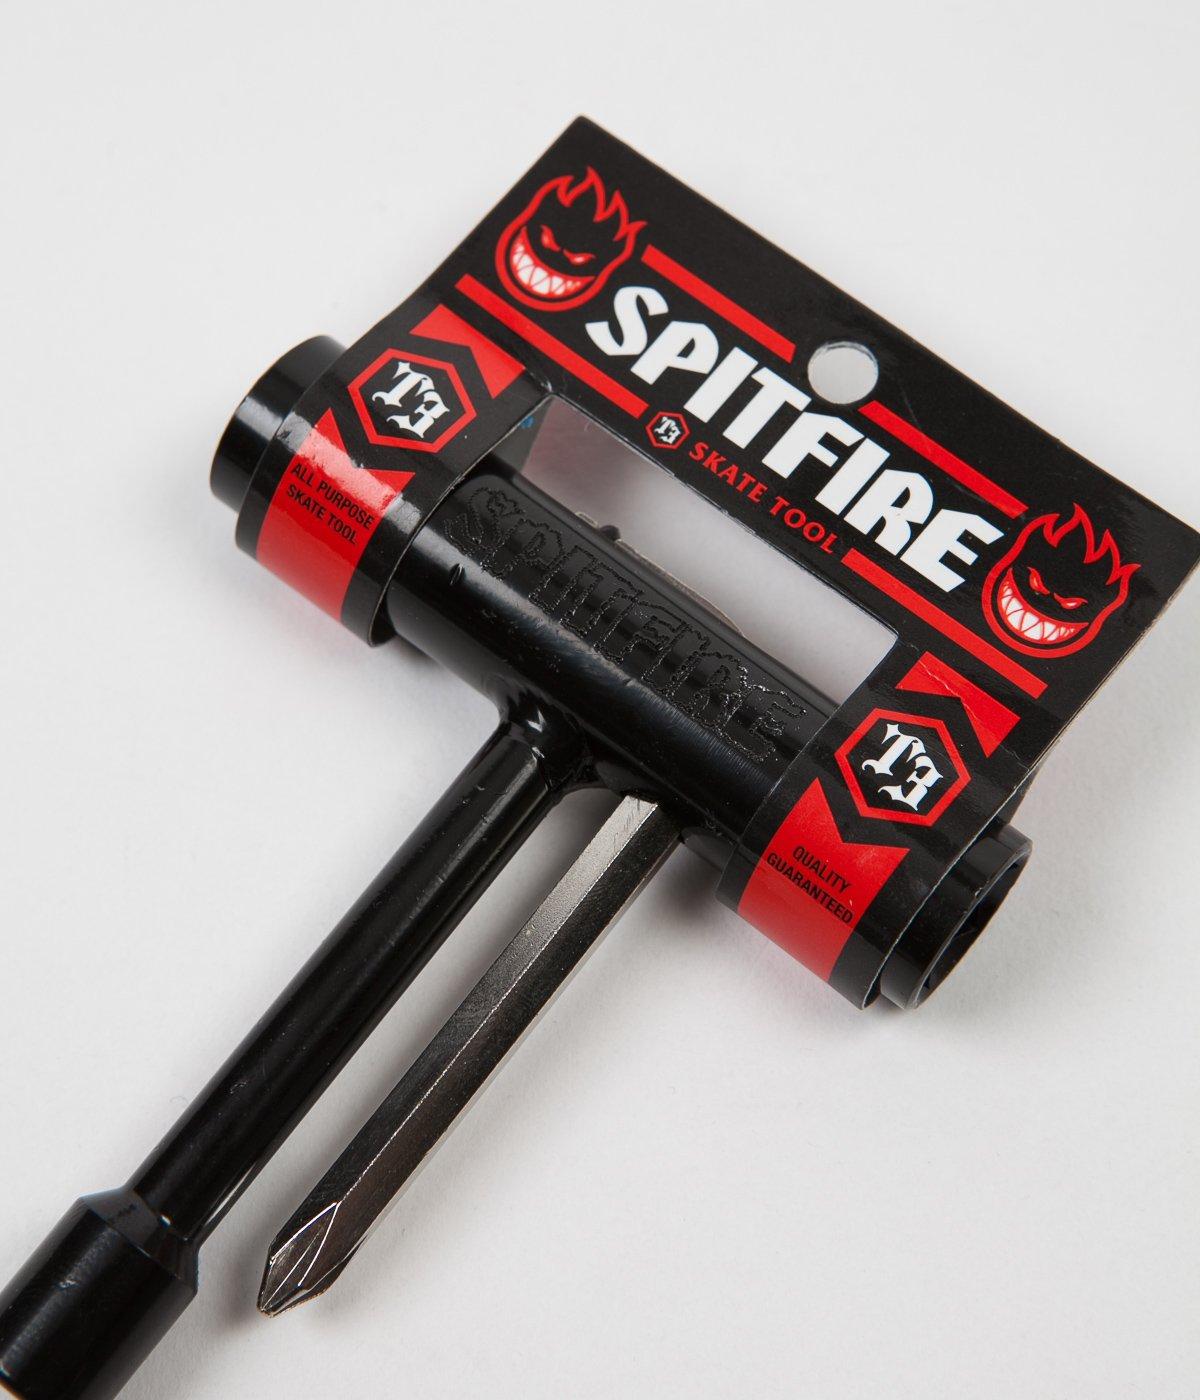 Spitfire Wheels T3 Multi-Purpose Skate Tool